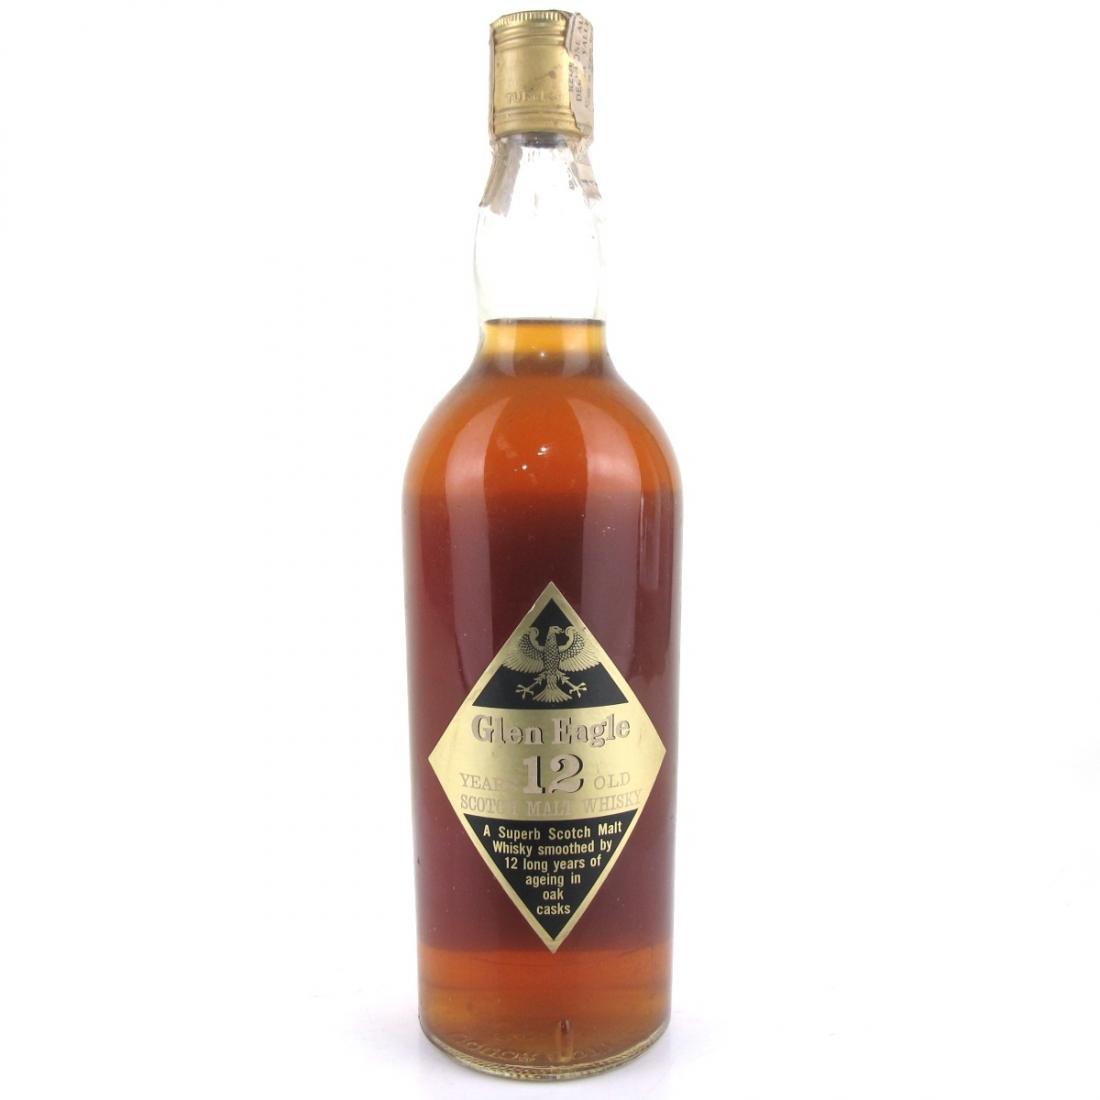 Glen Eagle 12 Year Old Scotch Whisky 1970s